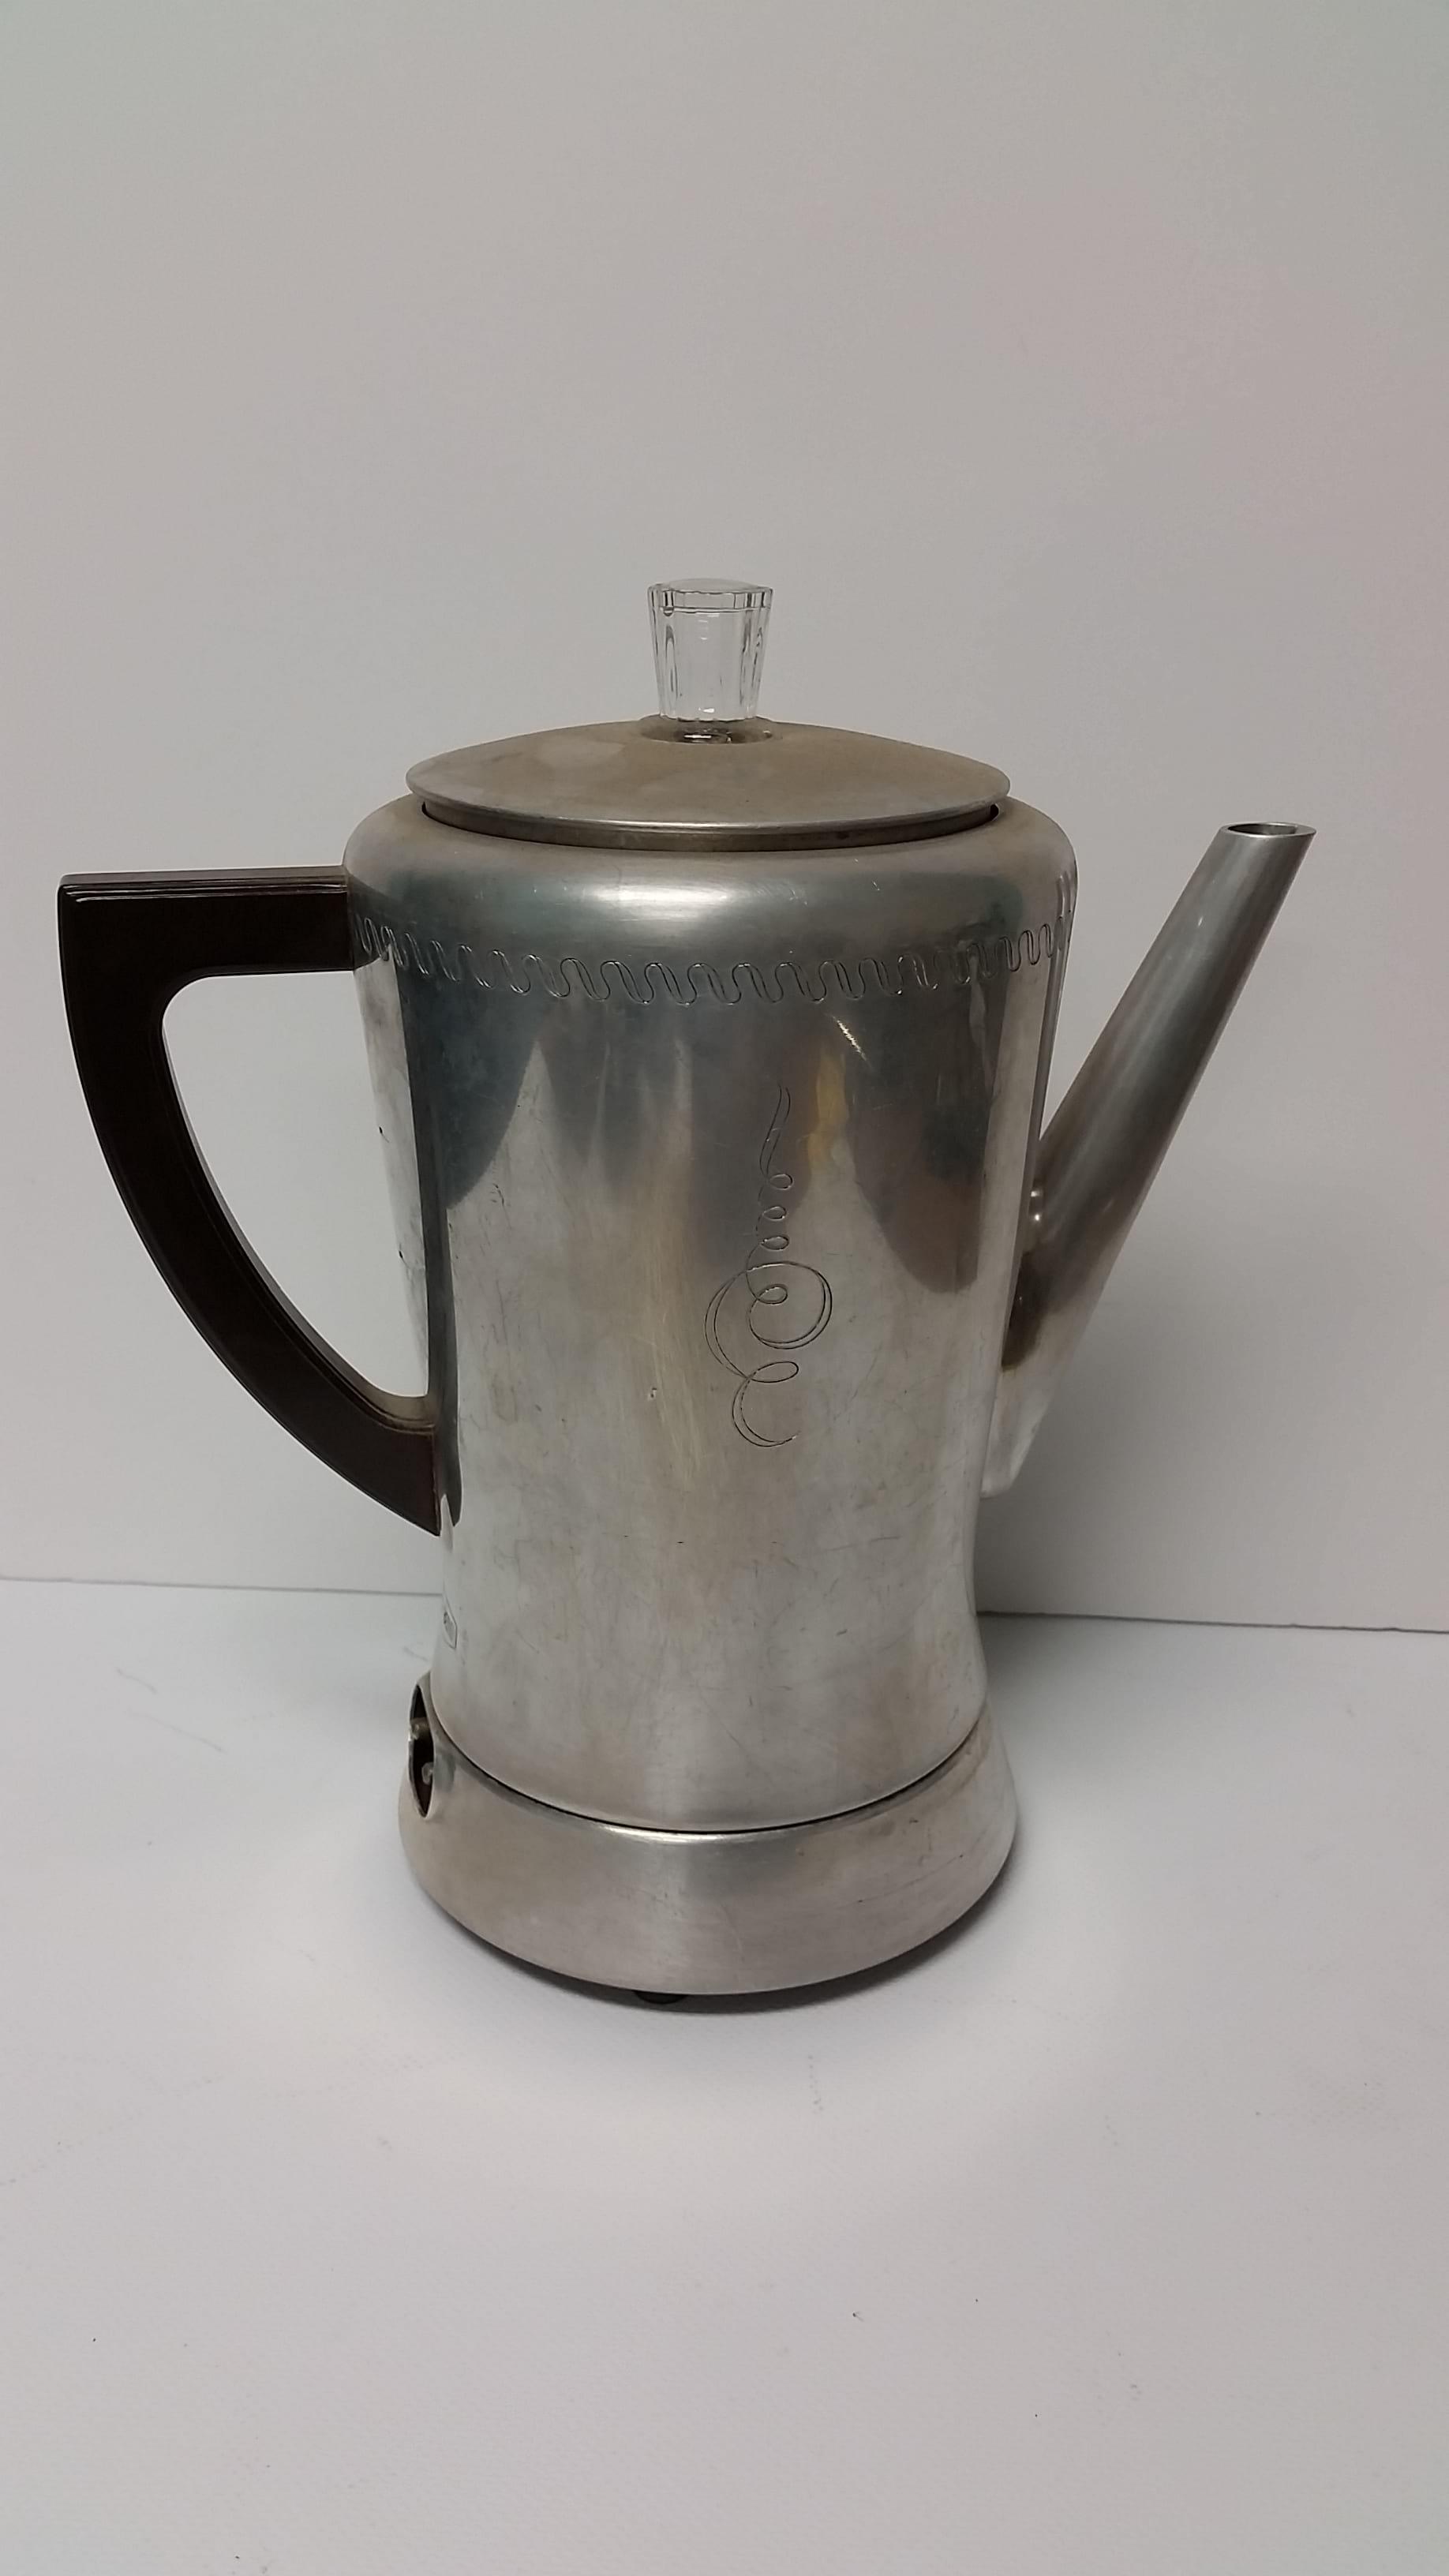 Coffee Pot - Electric Percolator